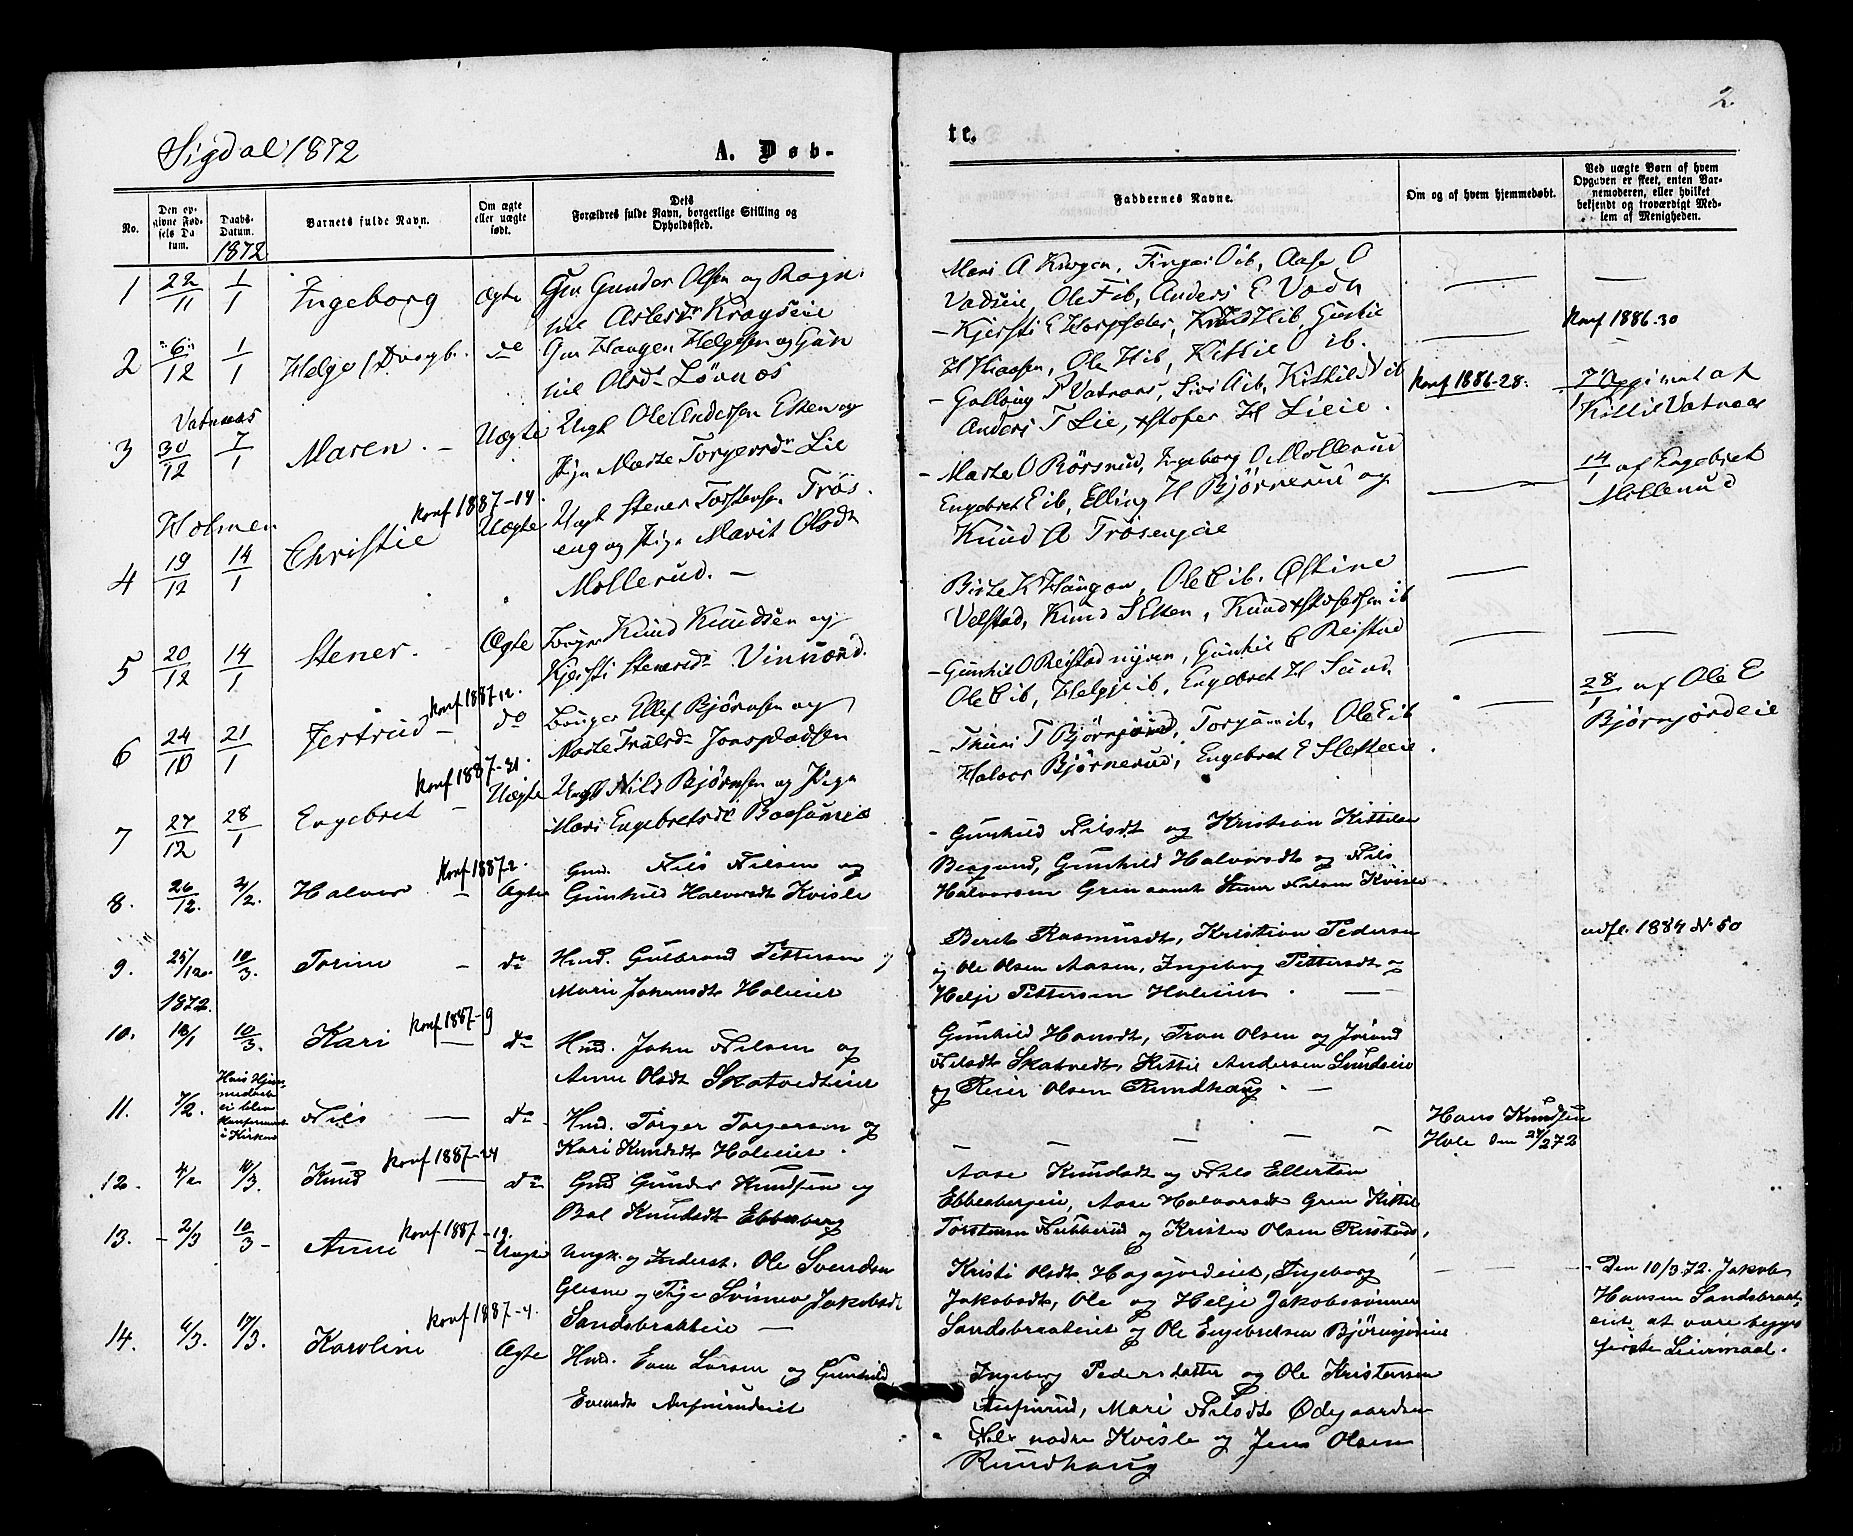 SAKO, Sigdal kirkebøker, F/Fa/L0010: Parish register (official) no. I 10 /1, 1872-1878, p. 2